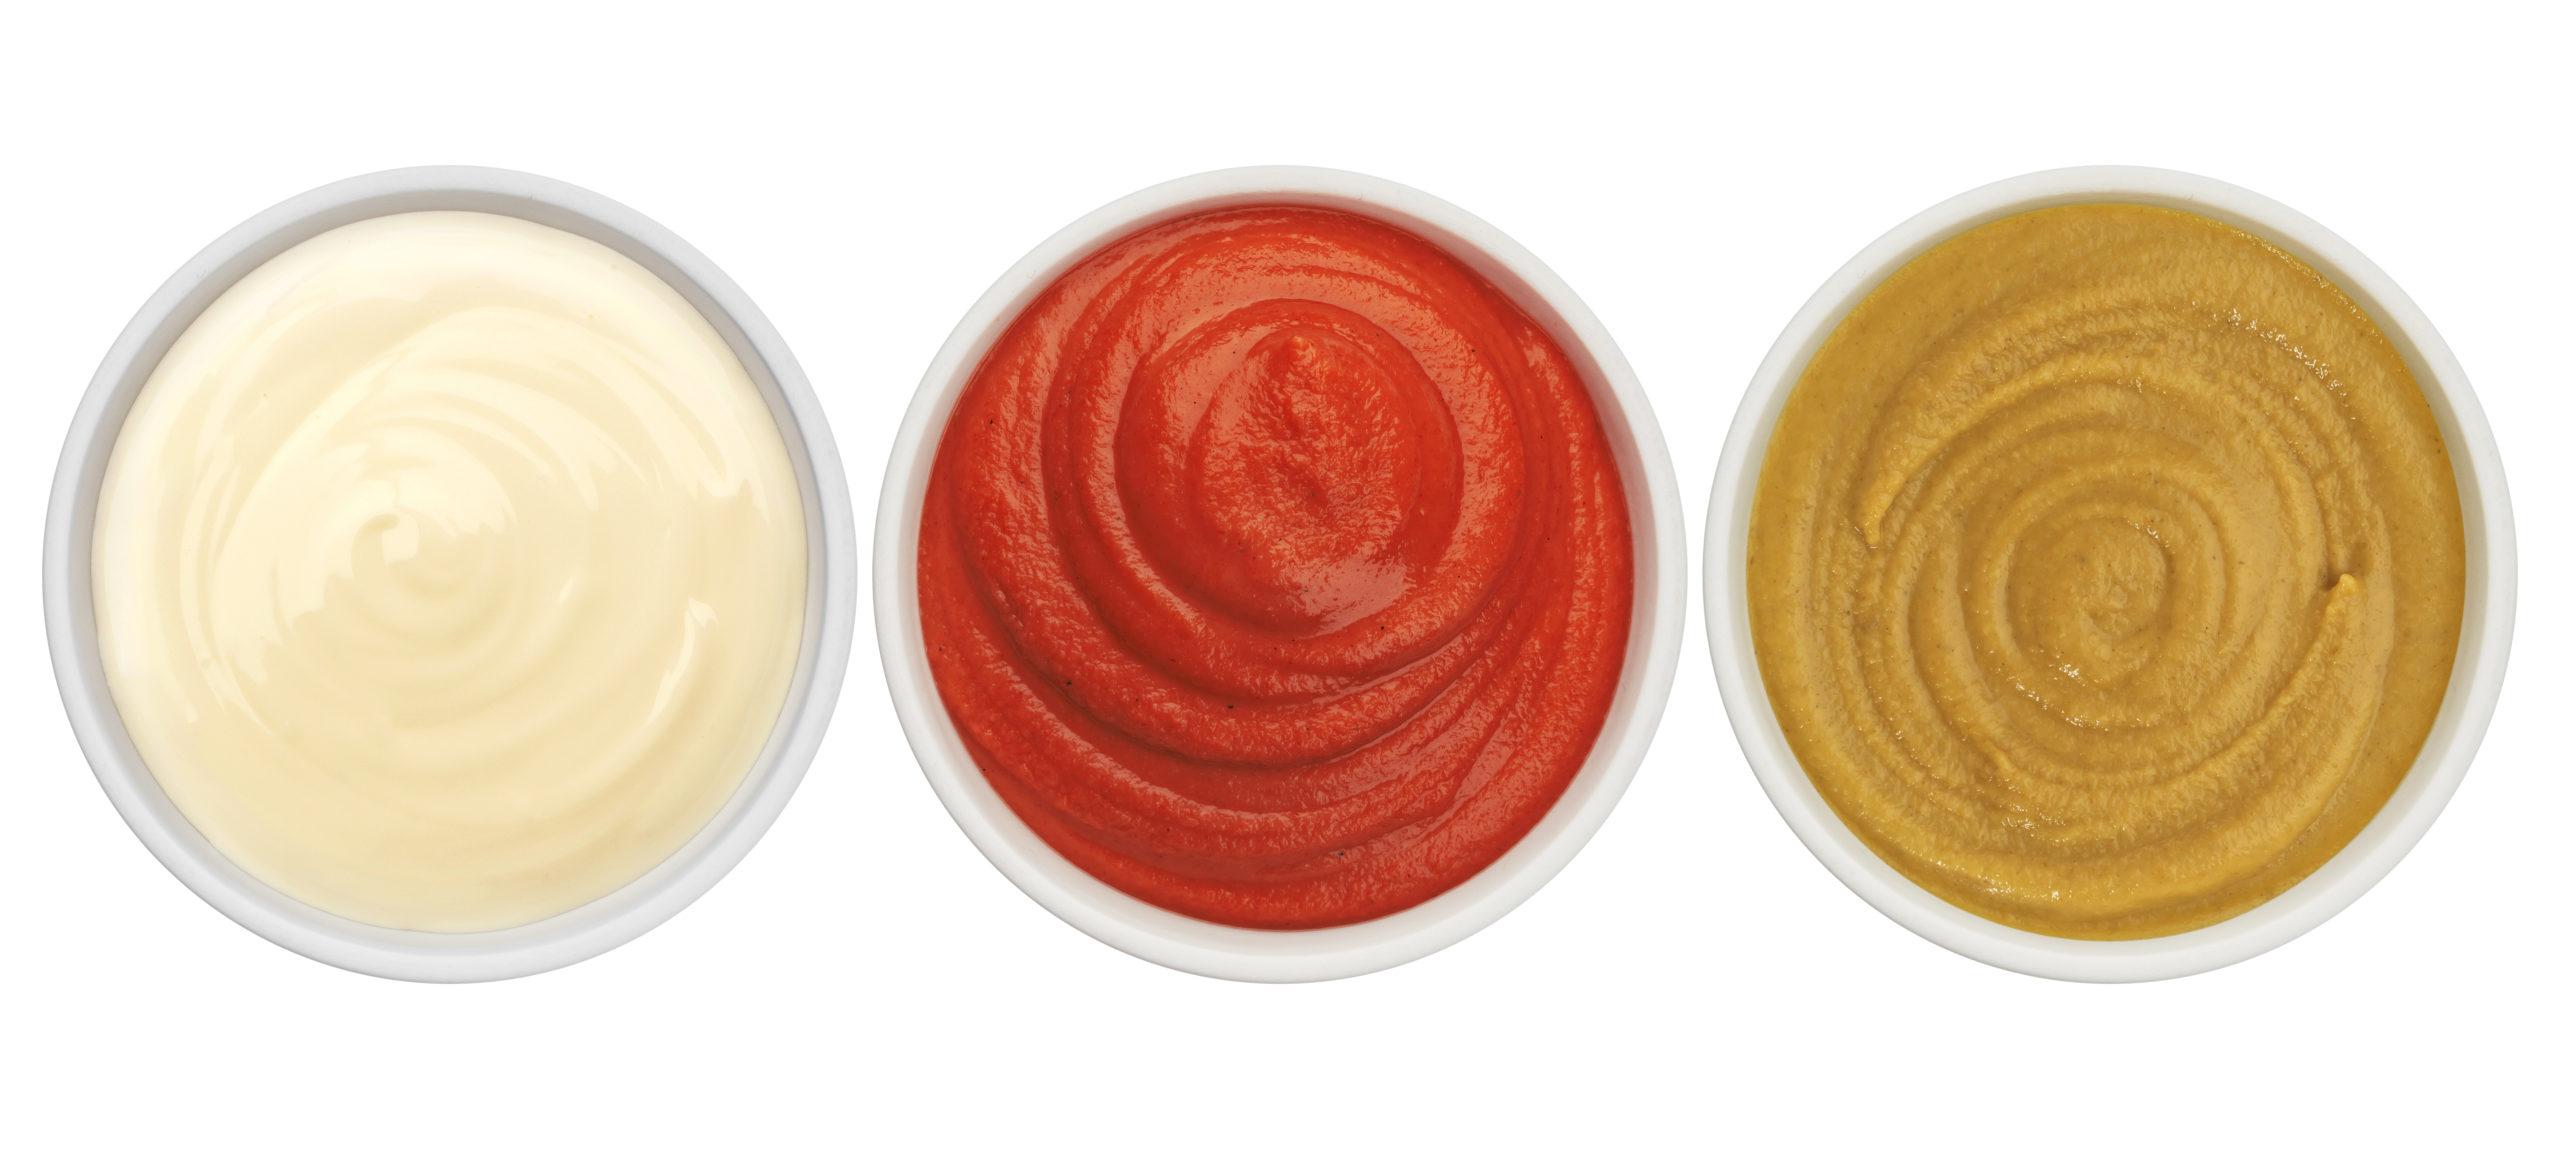 Bolsas de catsup, mostaza y otras salsas, serán 100% biodegradables